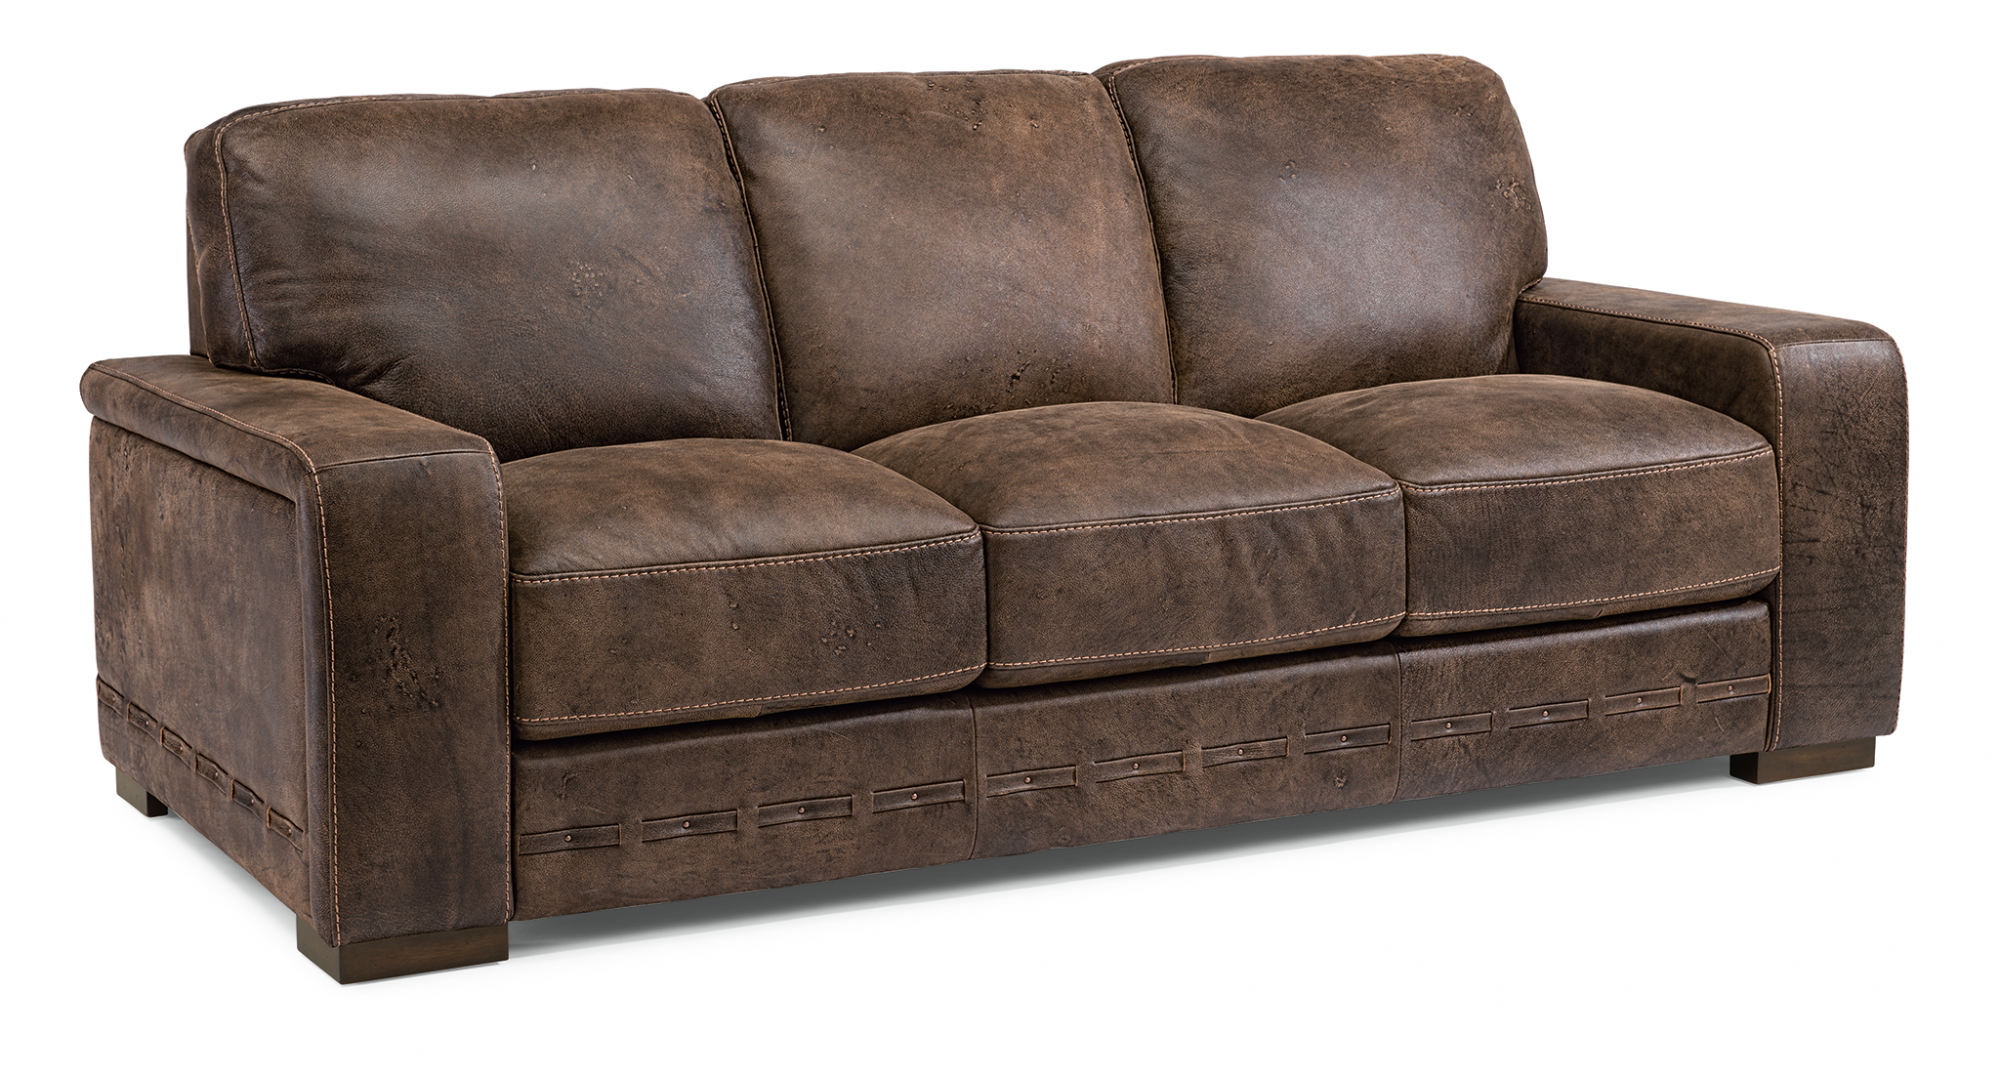 contemporary leather sofa sleeper. leather sofa contemporary sleeper